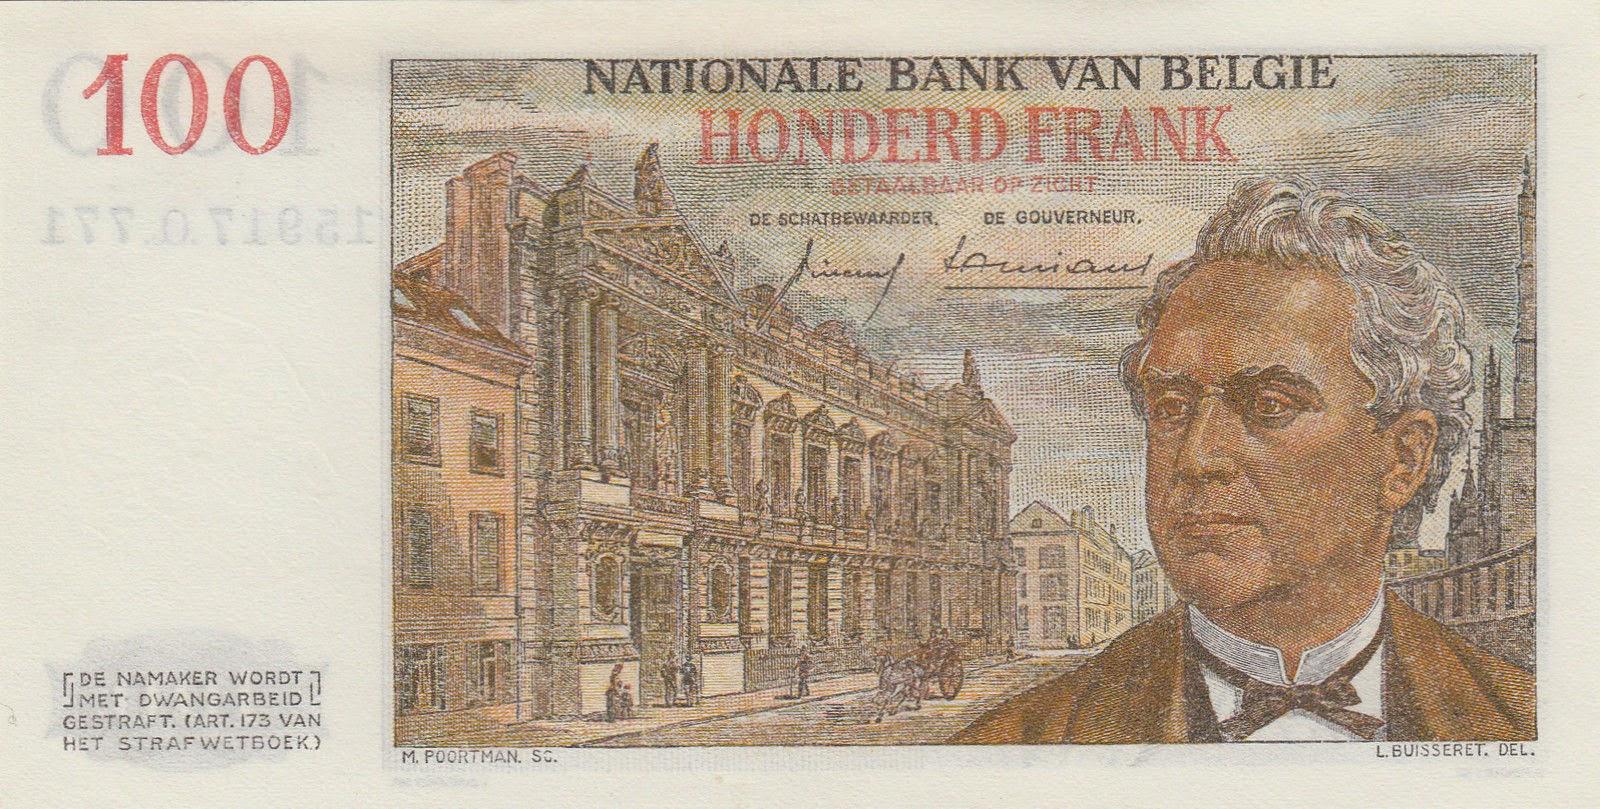 Belgium Banknotes 100 Francs bank note 1959